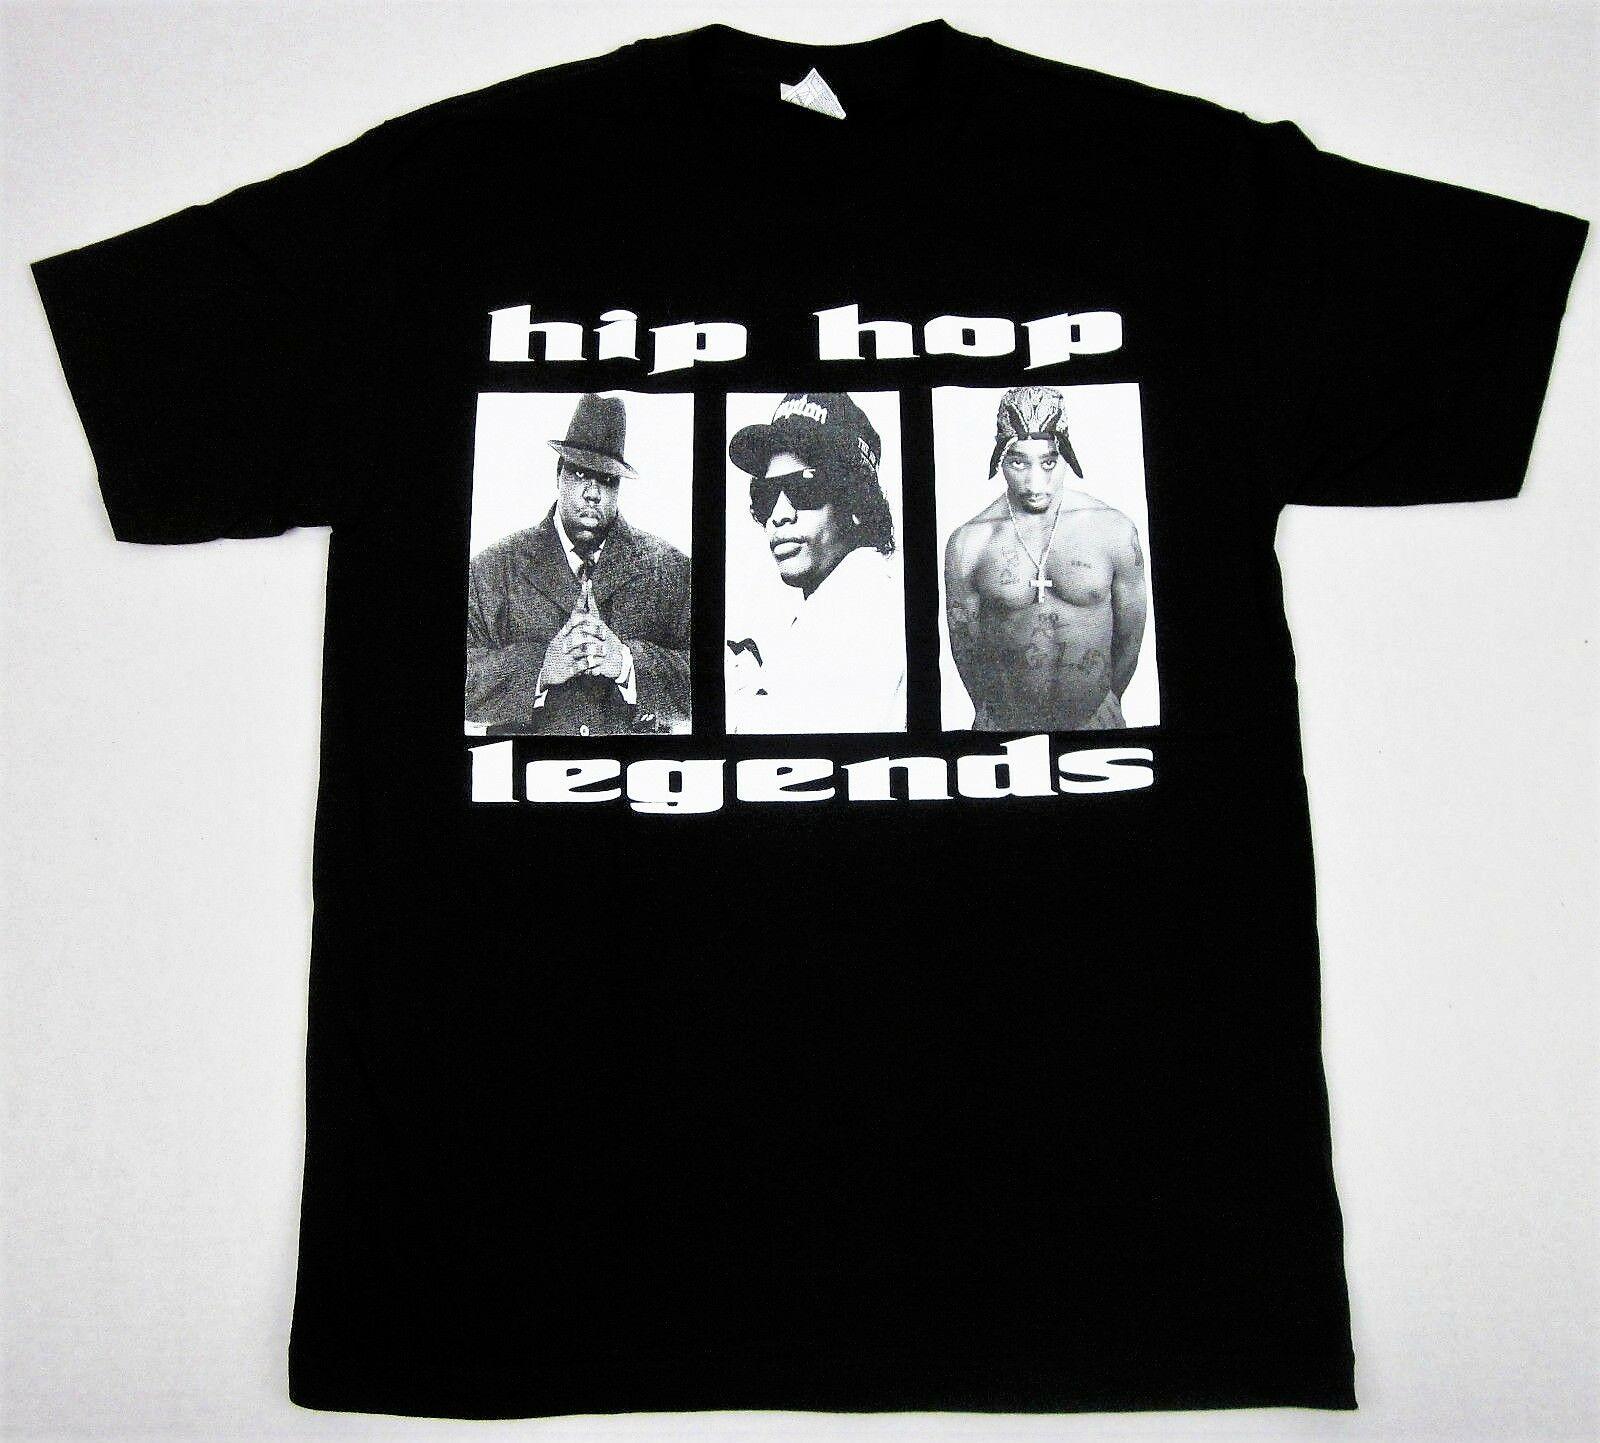 TUPAC BIGGIE EazyE T-shirt Hip Hop Legends Rap Notorious B.I.G. 2Pac Adult